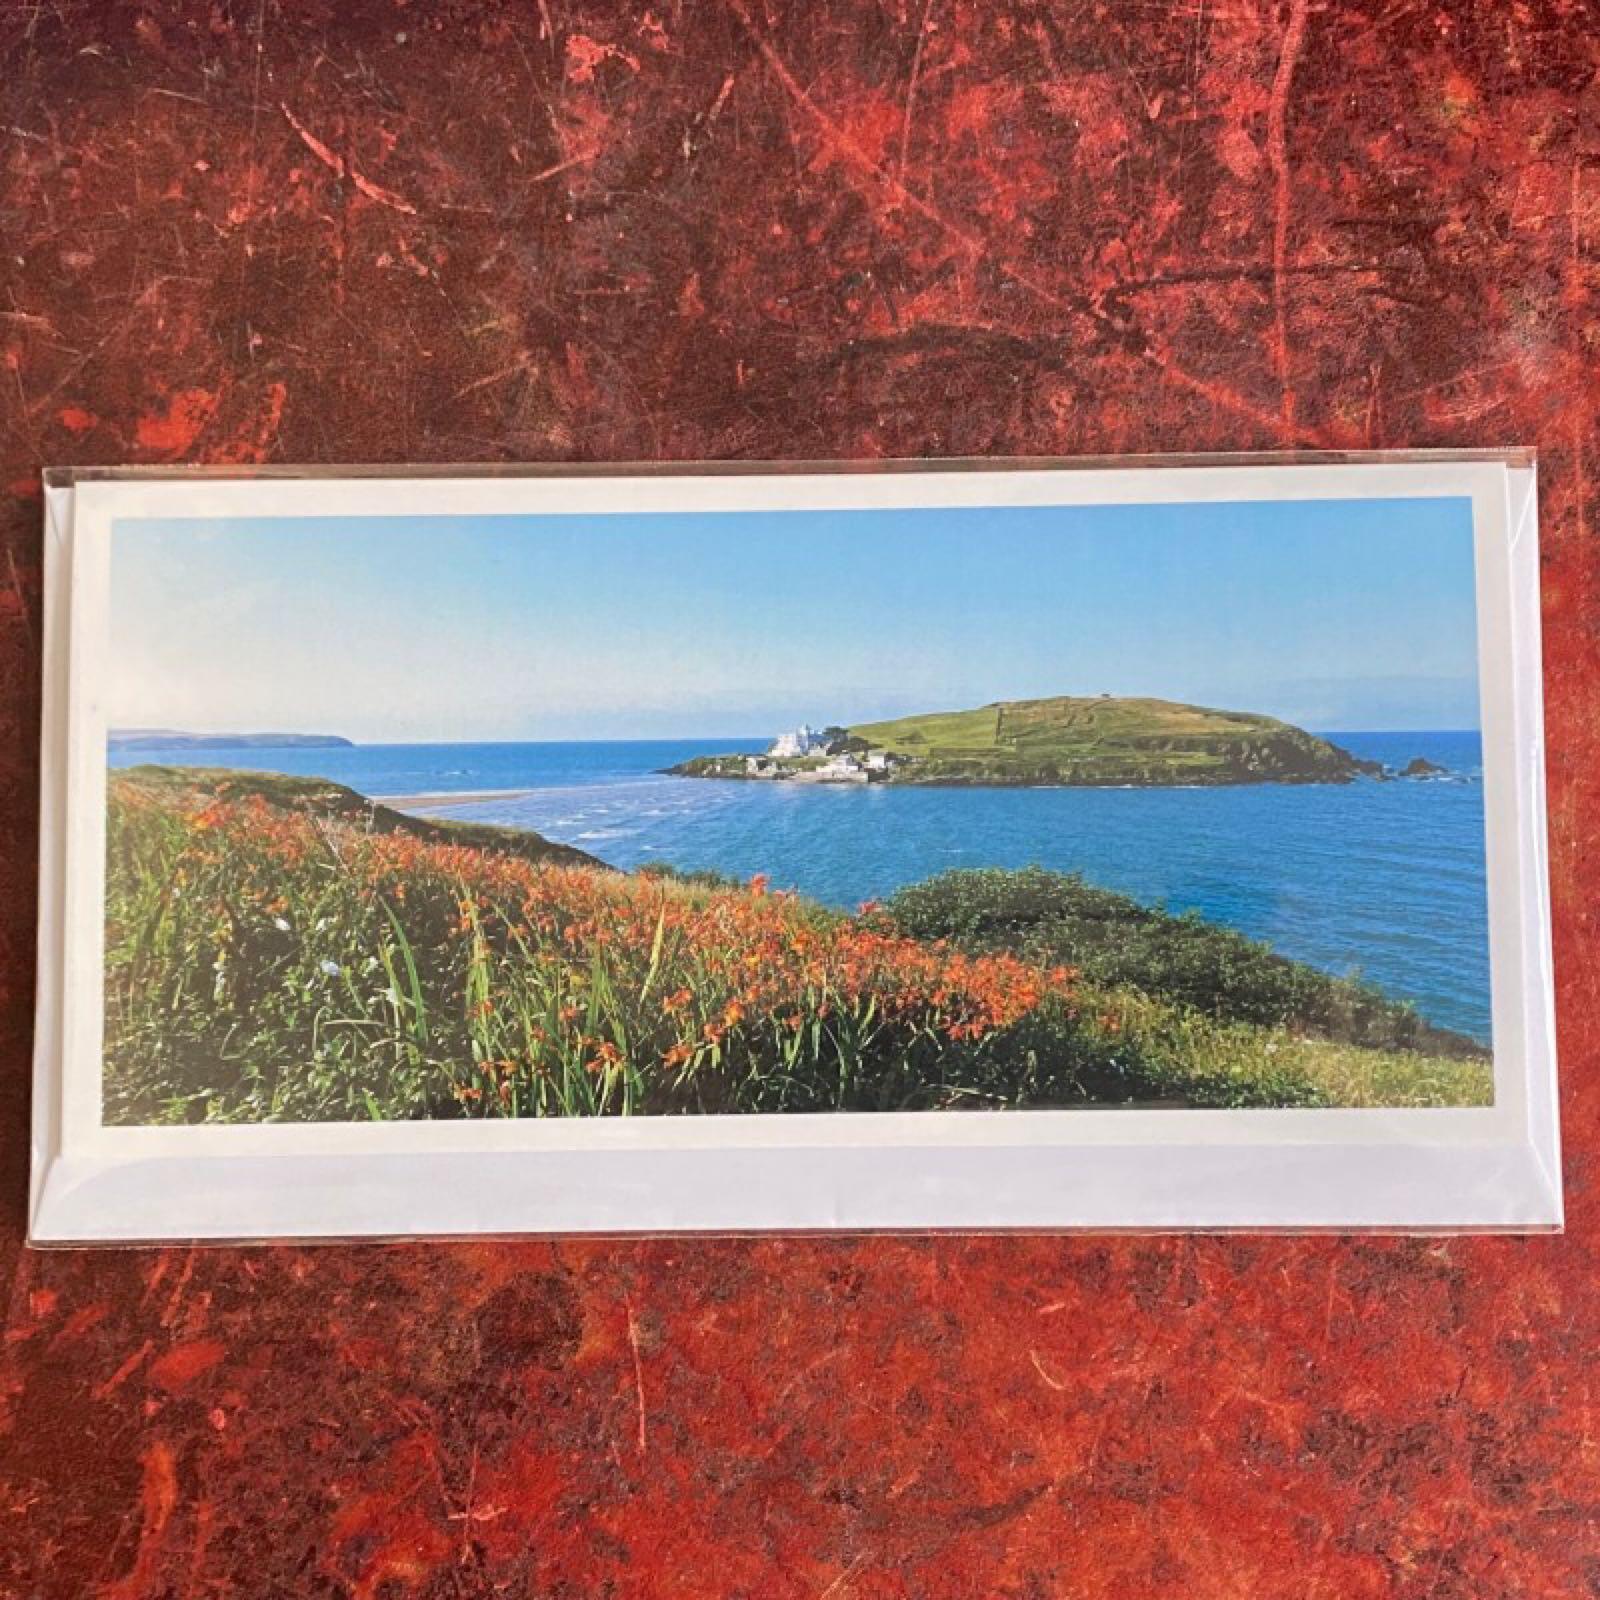 'Burgh Island' Blue Morpho Card (Was £2.75)